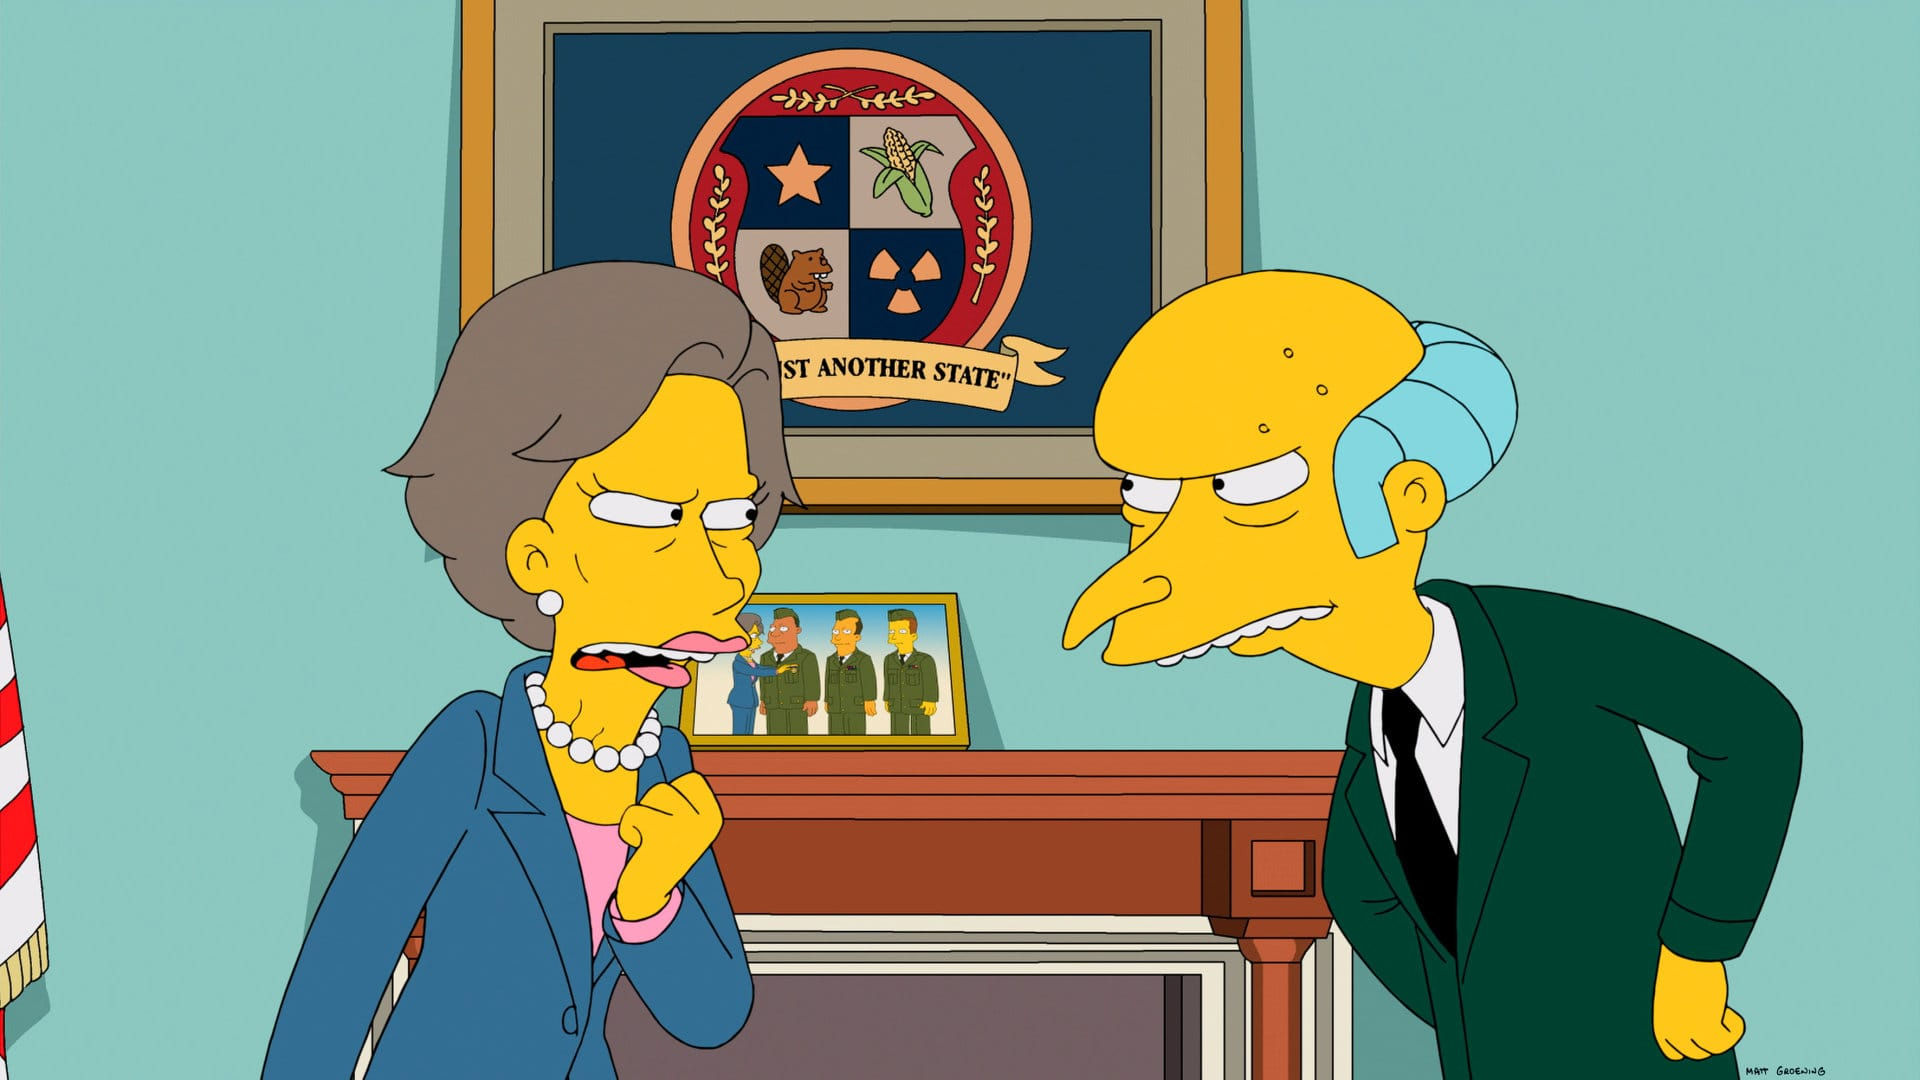 Les Simpson - Fric-Frack